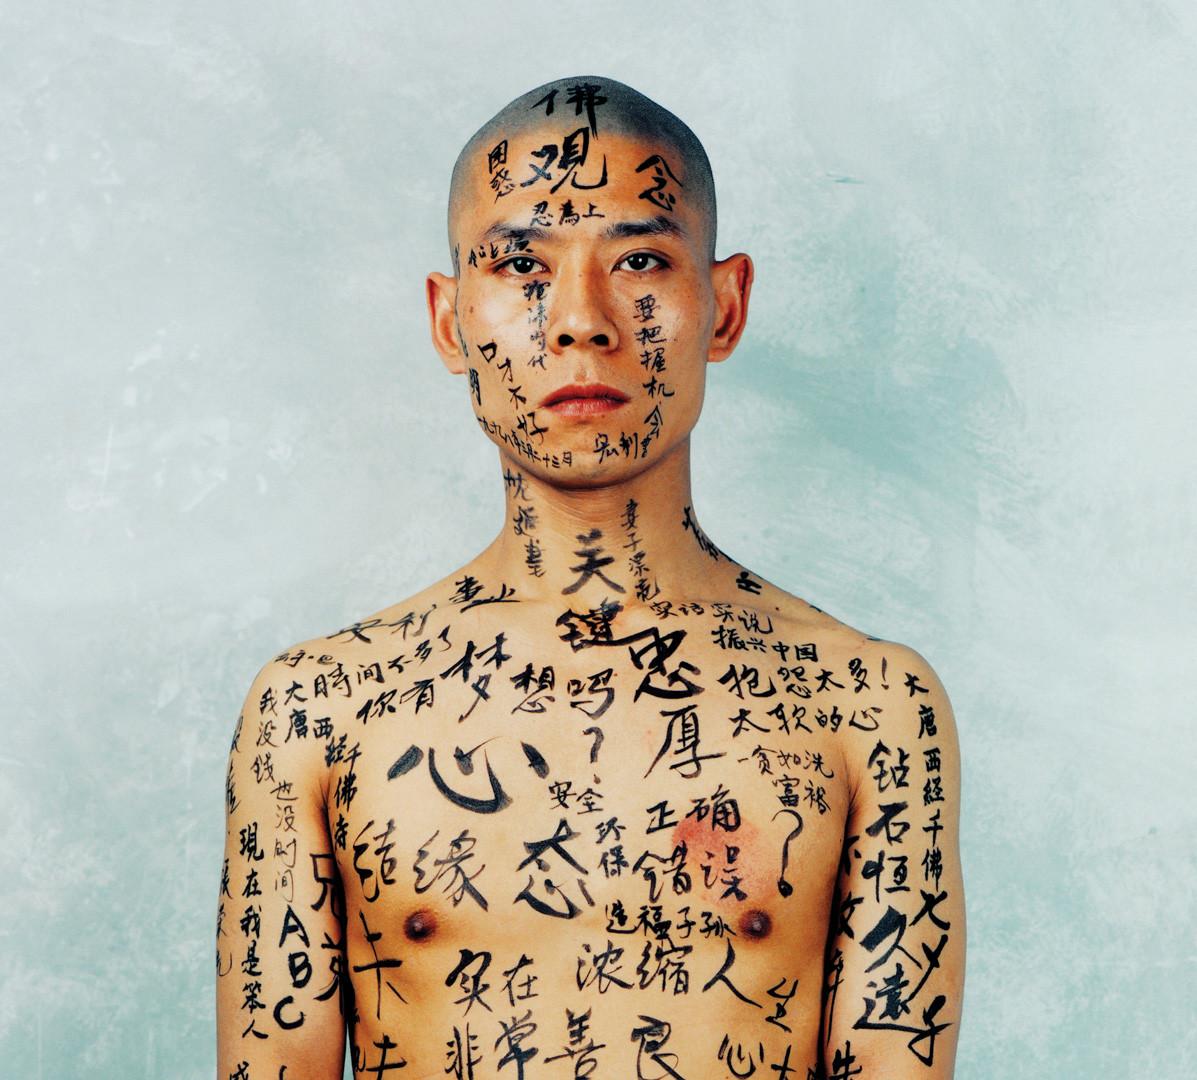 Zhang Huan, 1/2 (Text), 1998